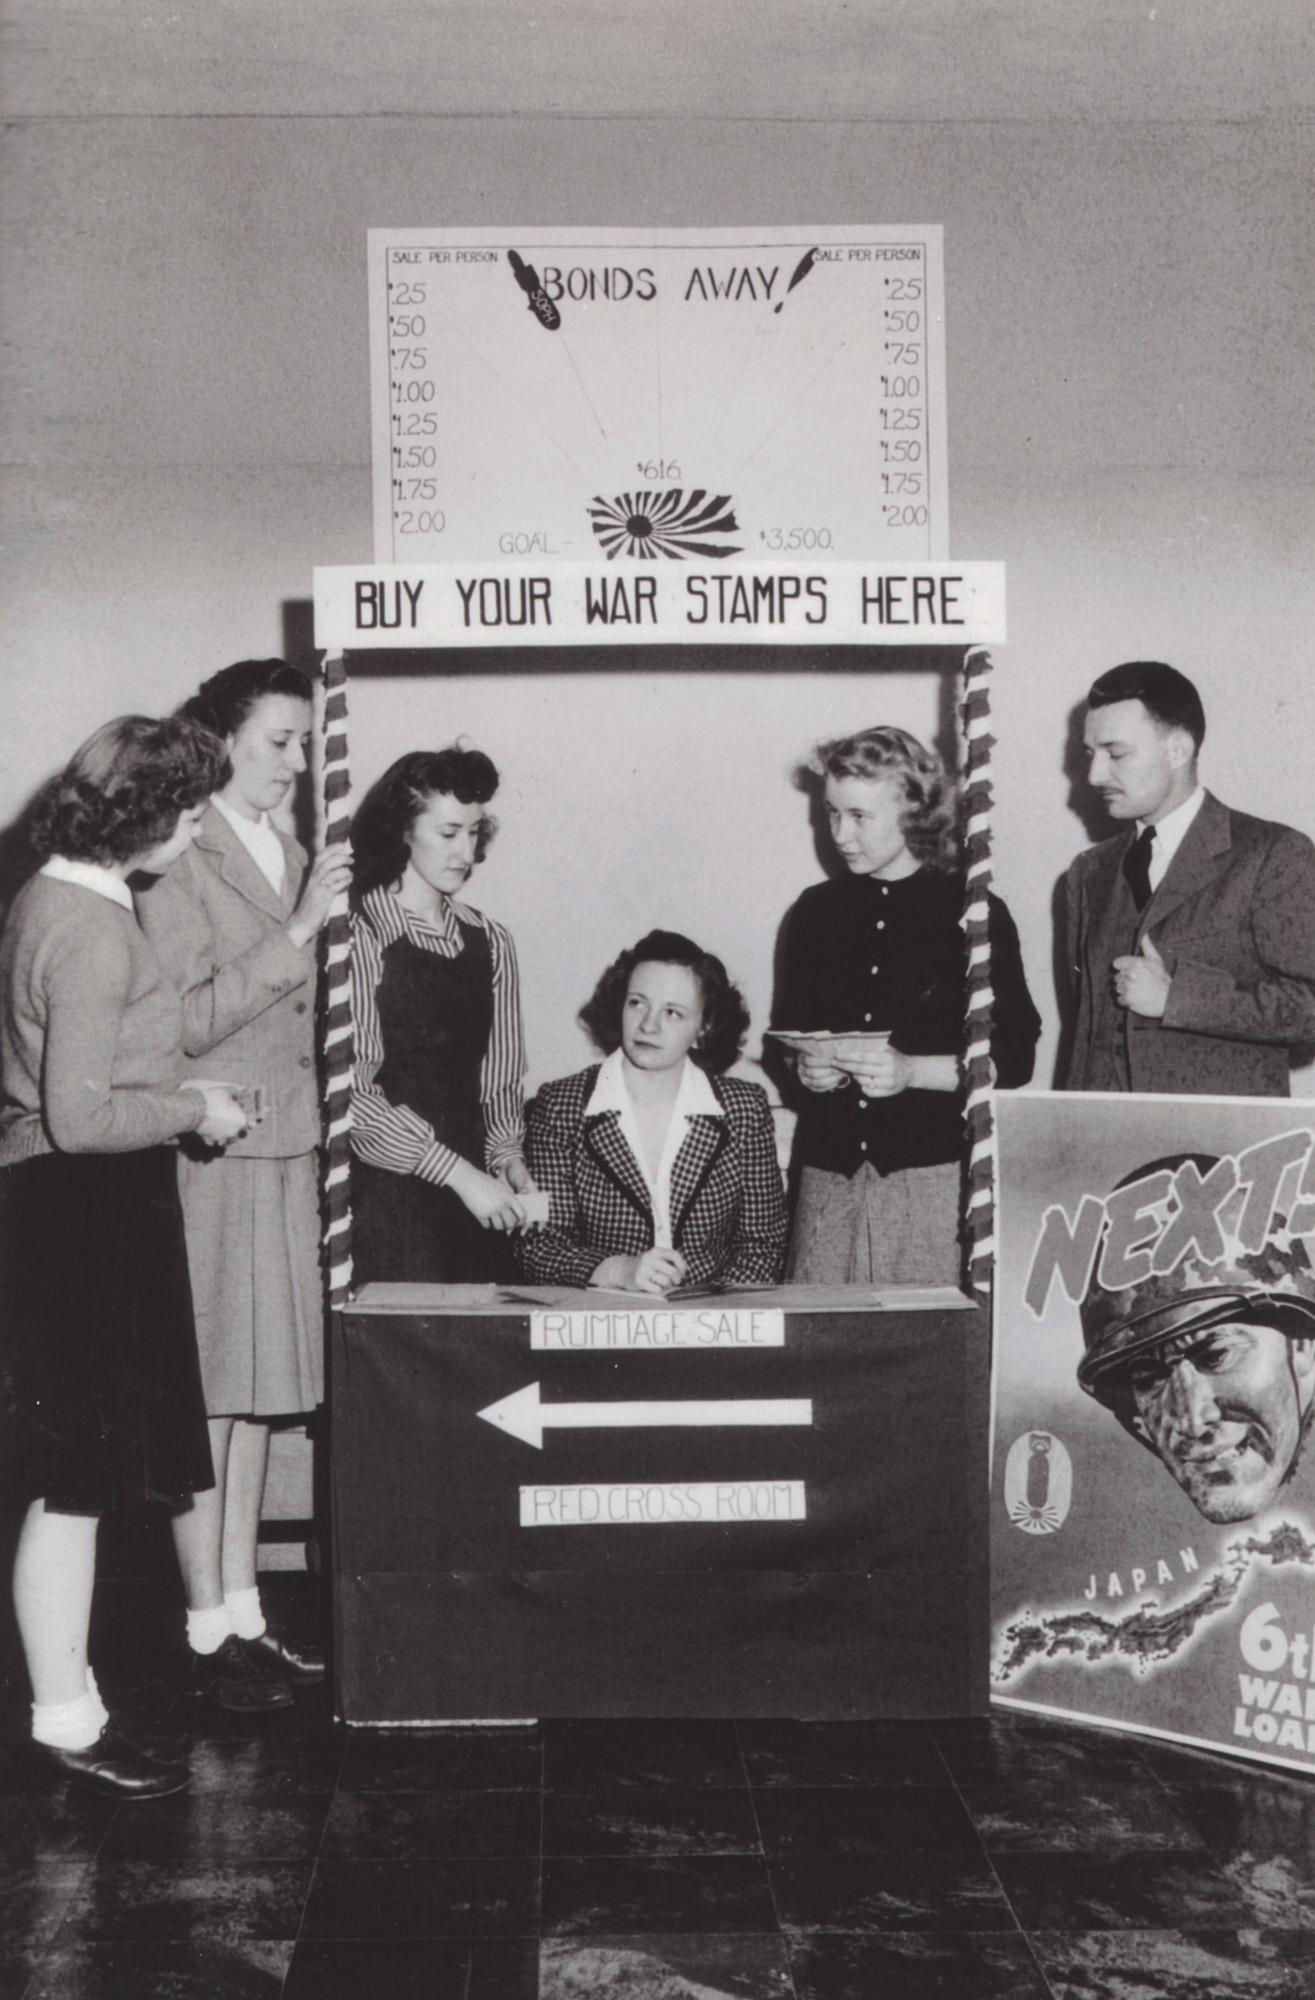 World War II war stamps booth